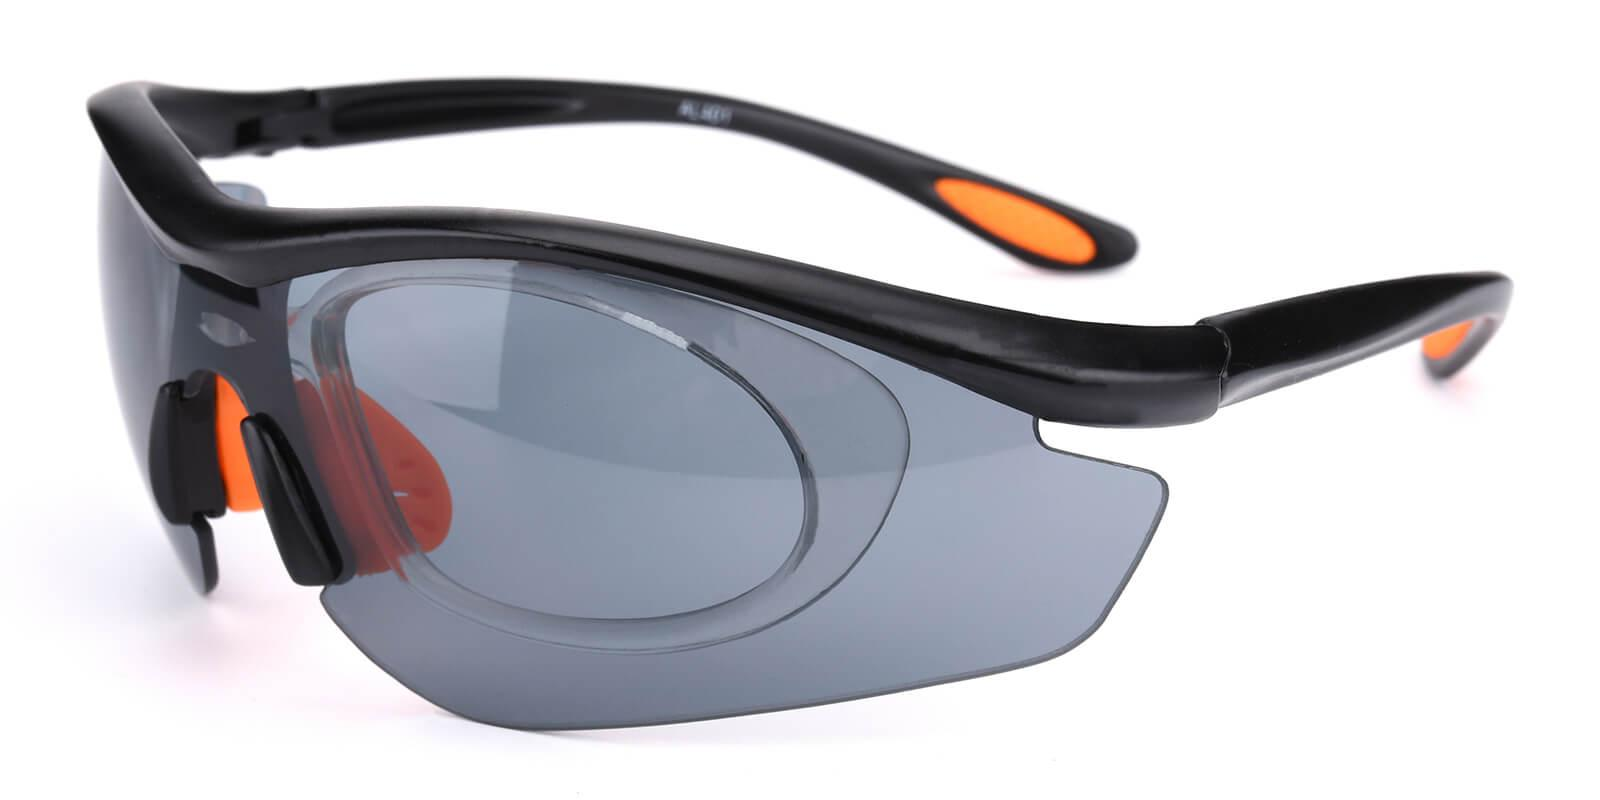 Preavey-Black-Square-Plastic-SportsGlasses-additional1